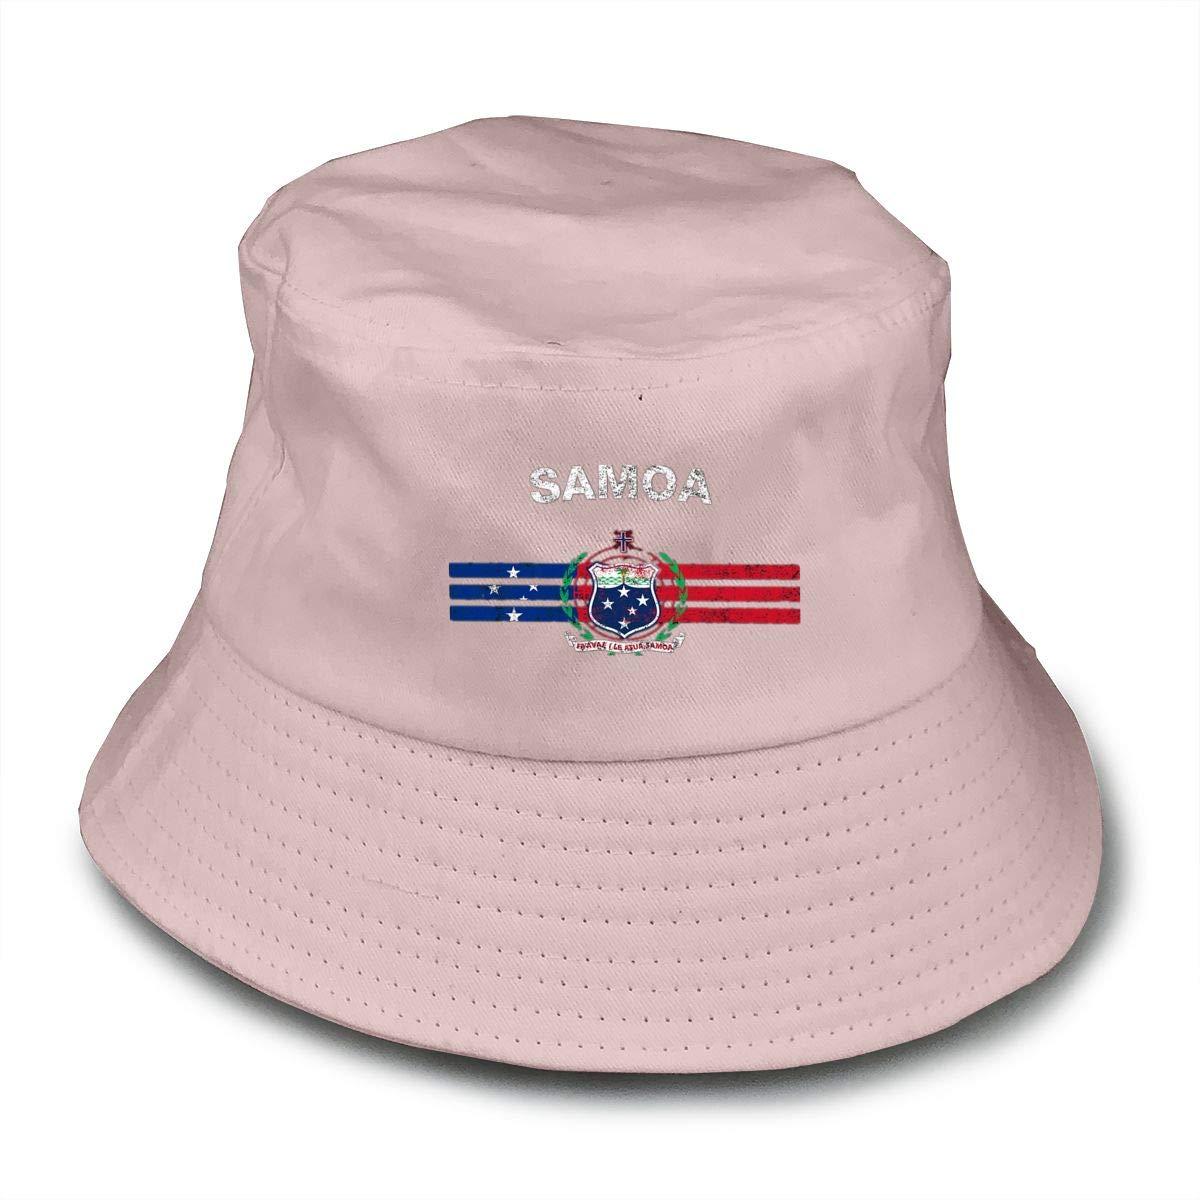 NDFGR Turkemenistan Unisex Cotton Packable Black Travel Bucket Hat Fishing Cap